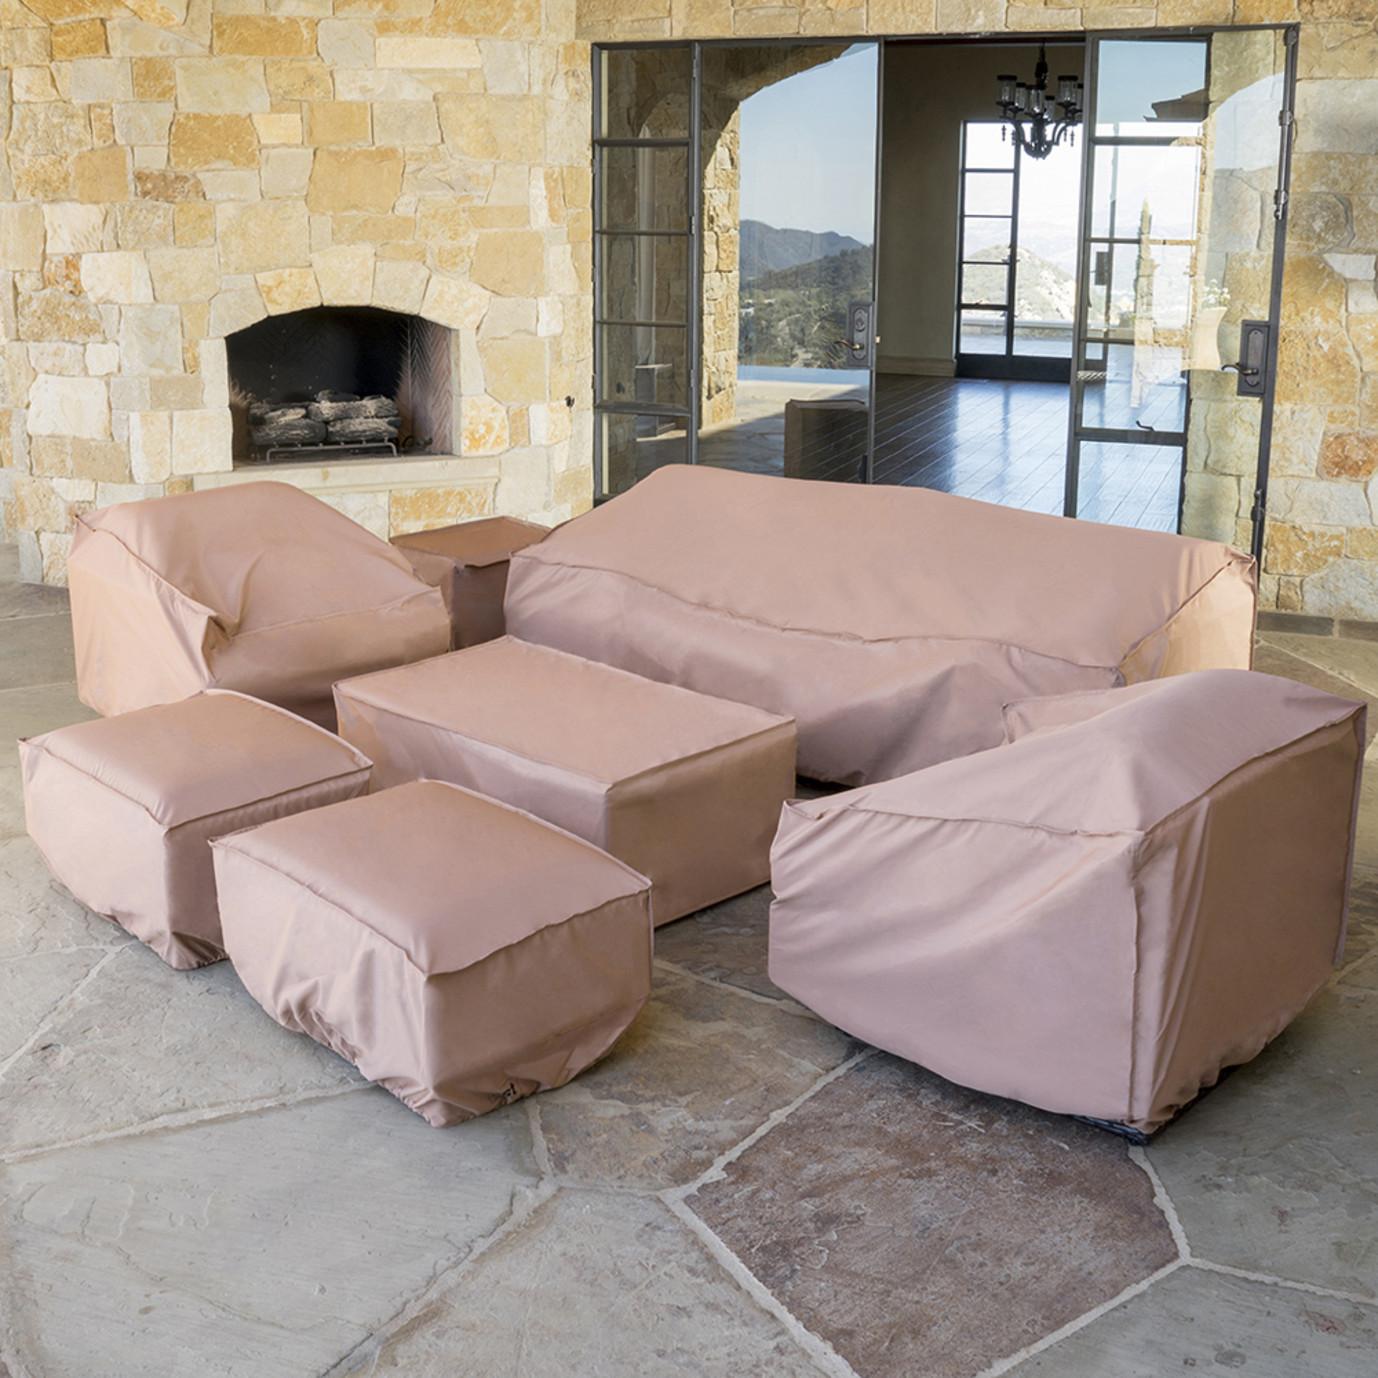 Portofino Comfort 7pc Furniture Cover Set